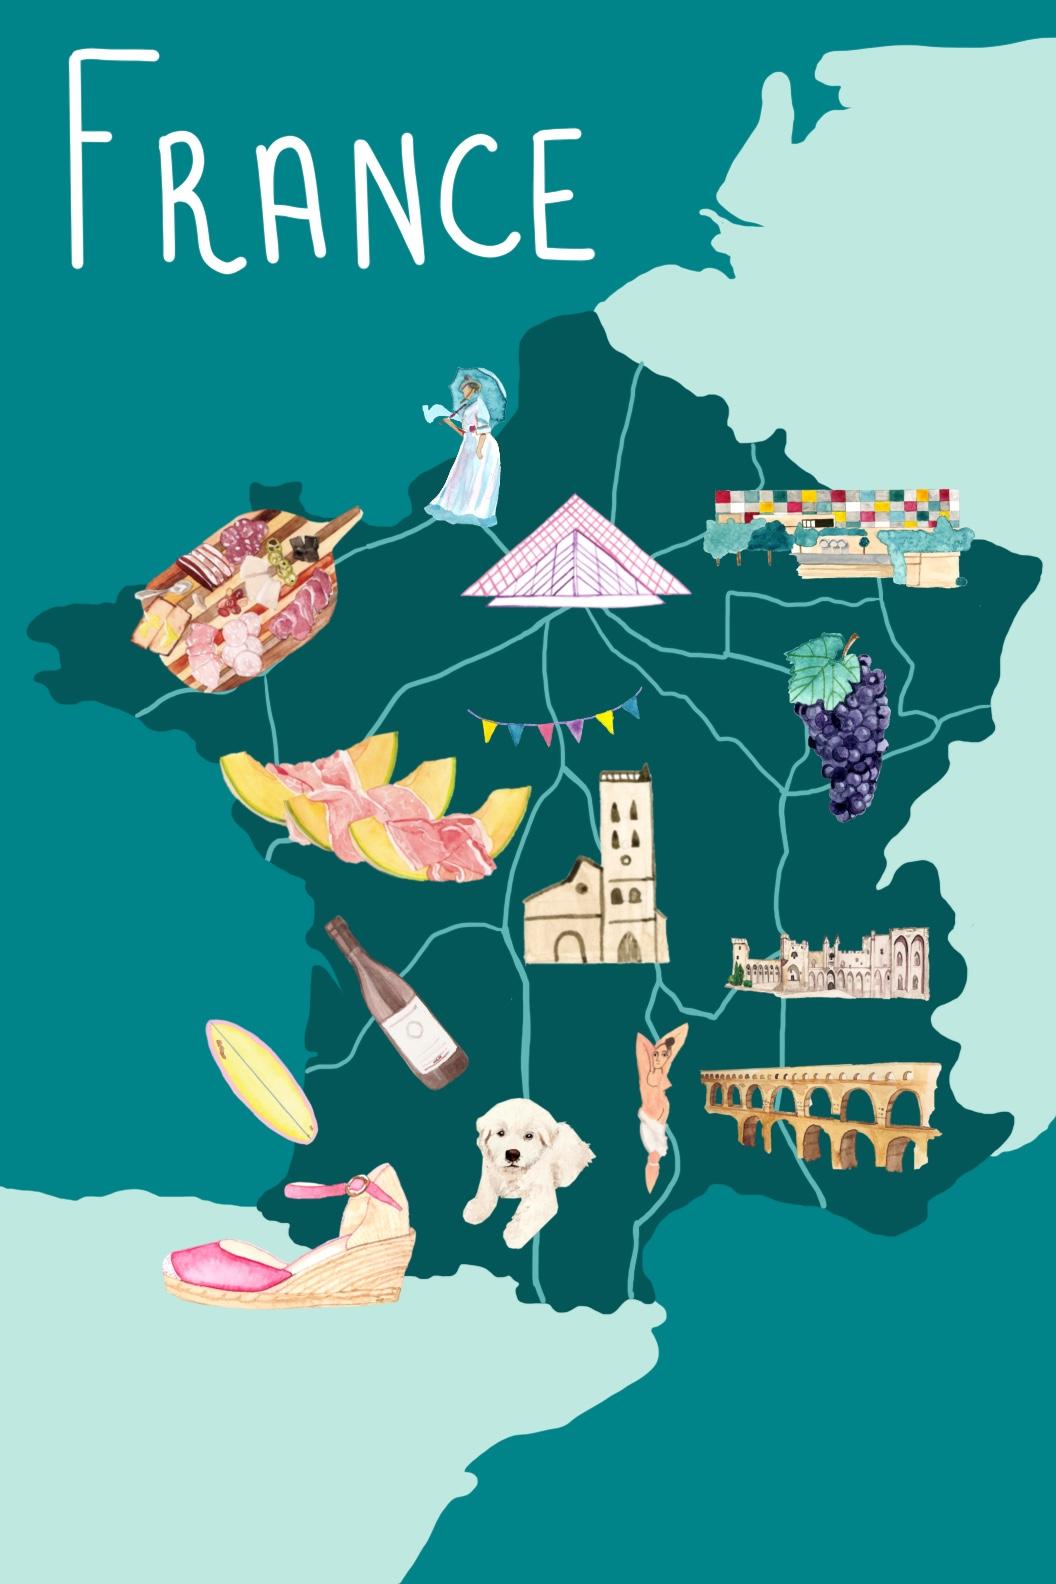 France Postcard.jpg